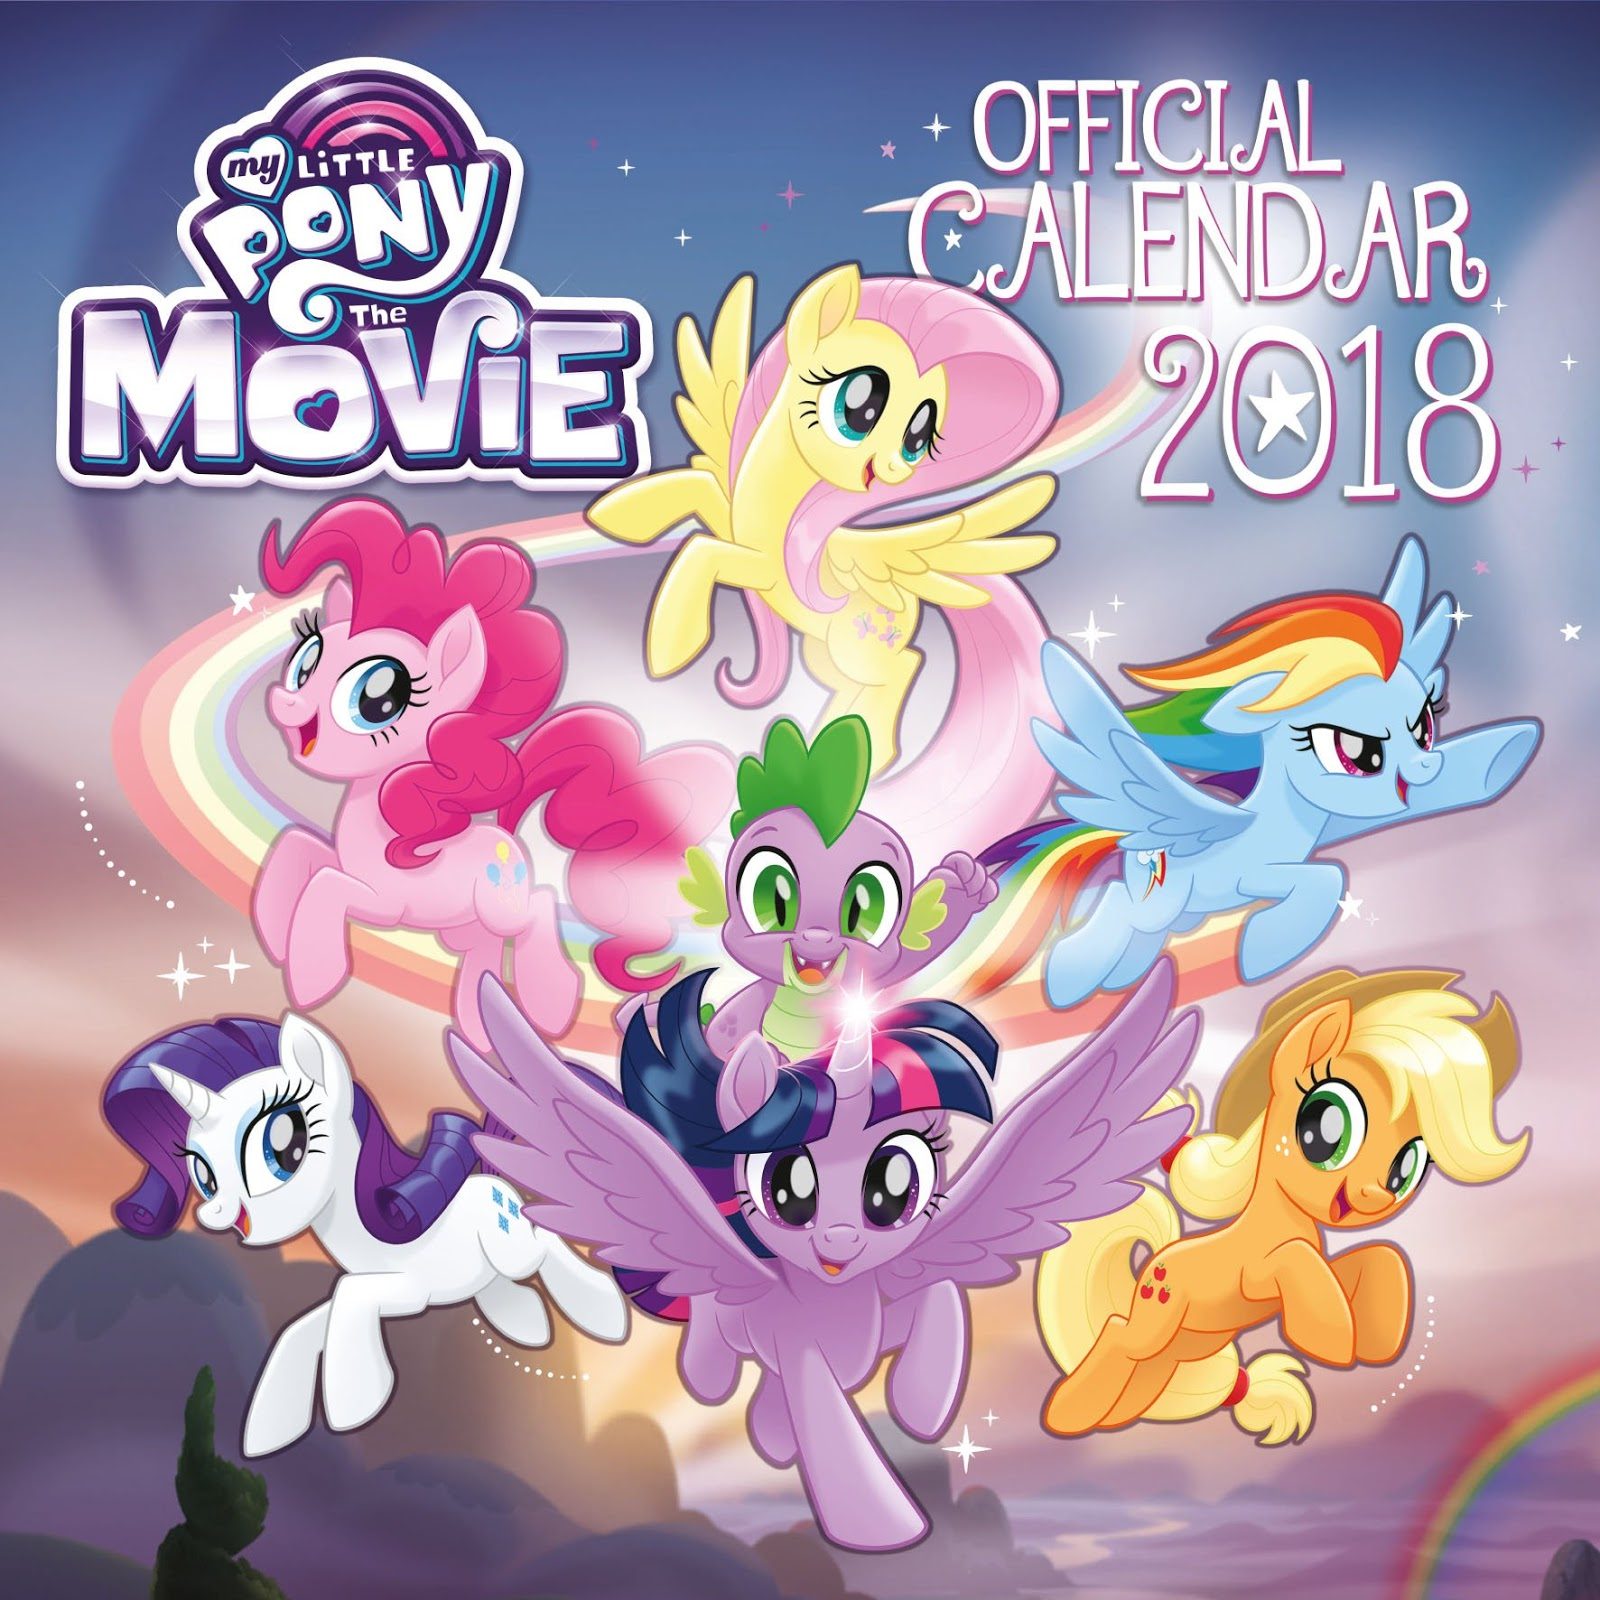 Mlp movie 2018 дата